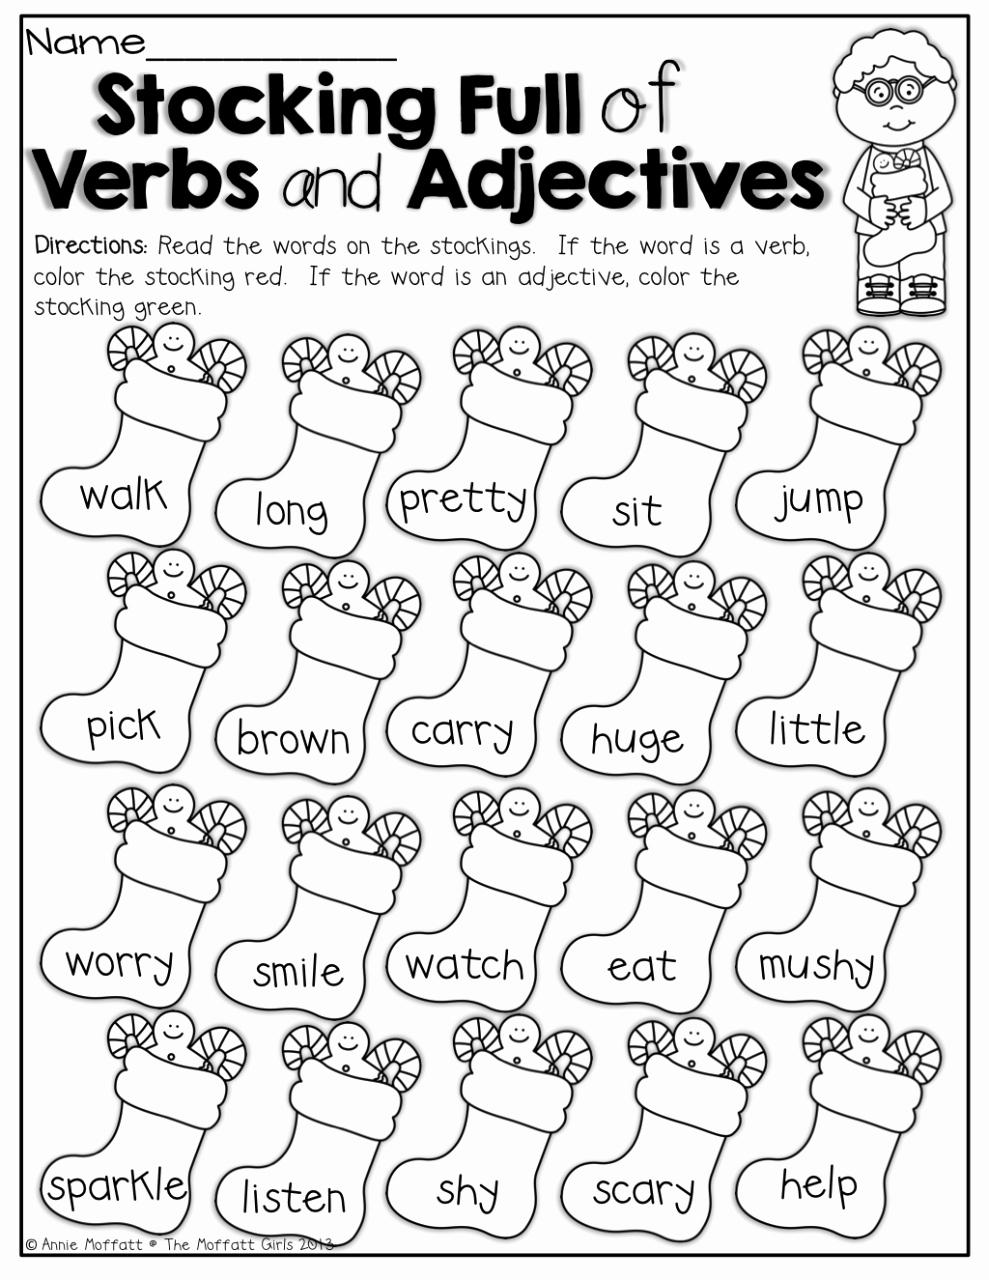 Verbs Worksheets First Grade Awesome Noun Verb Adjective Worksheet 1st Grade Kidsworksheetfun